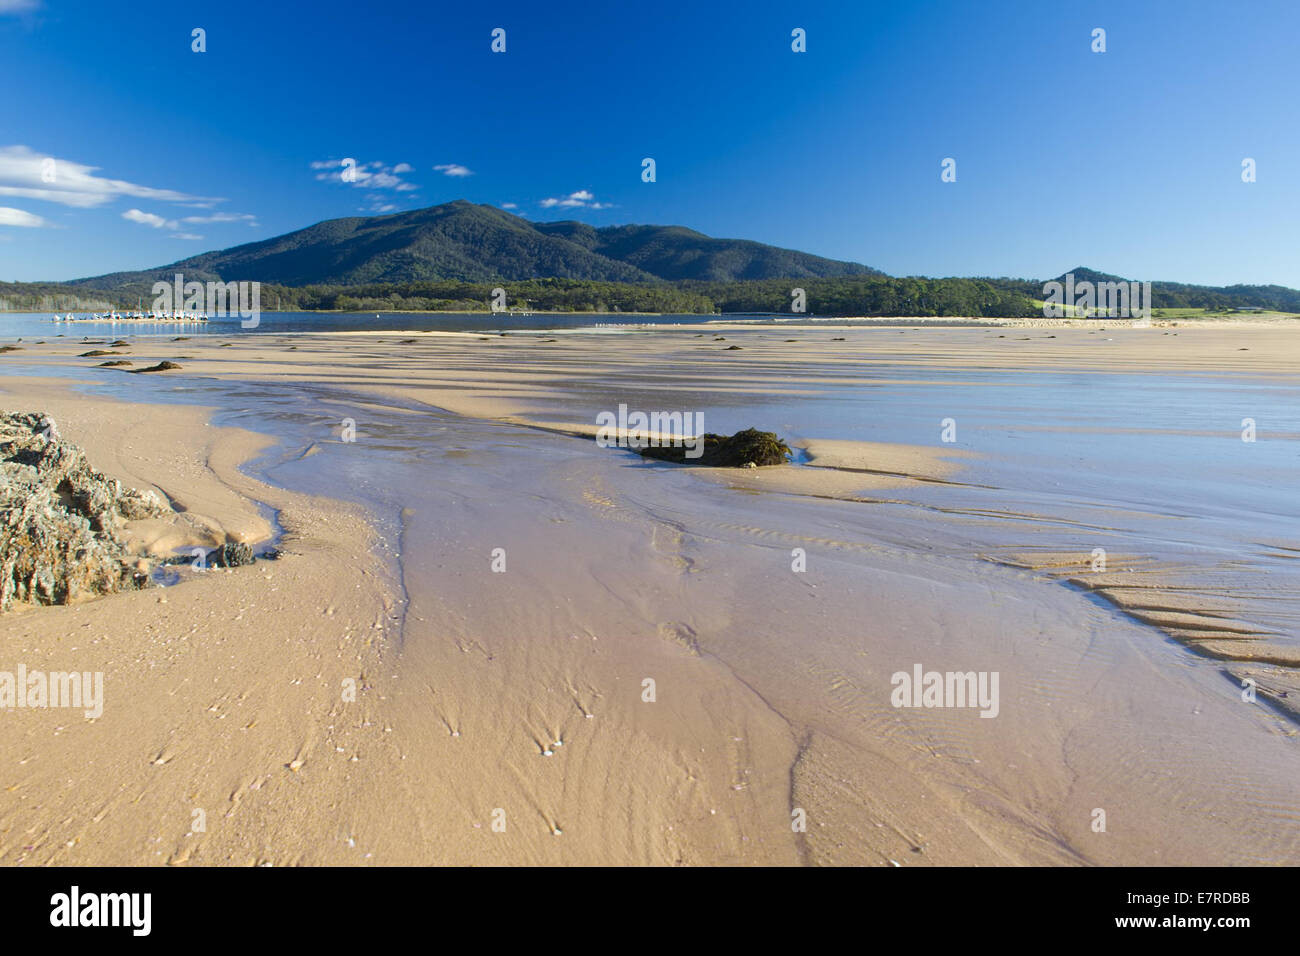 Sandbar Waterflow - Stock Image